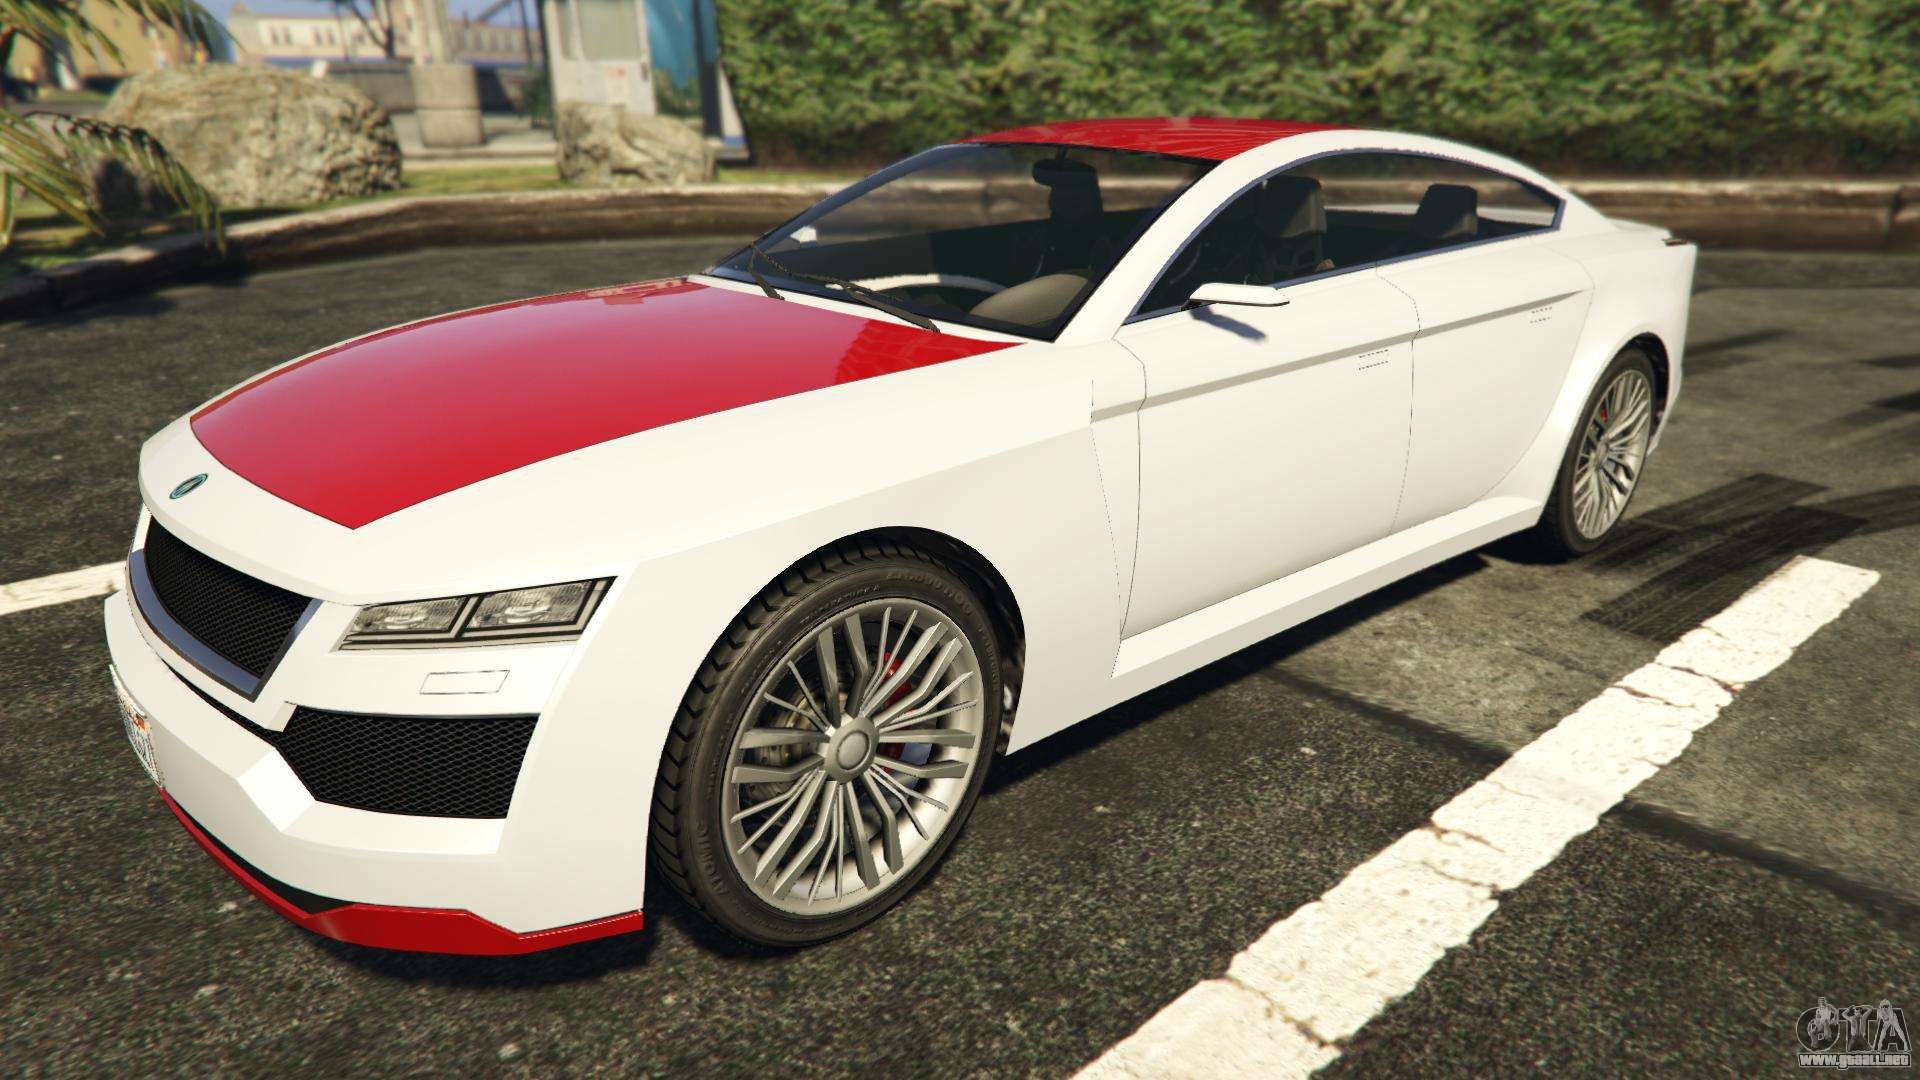 Ubermacht Revolter GTA 5 Online